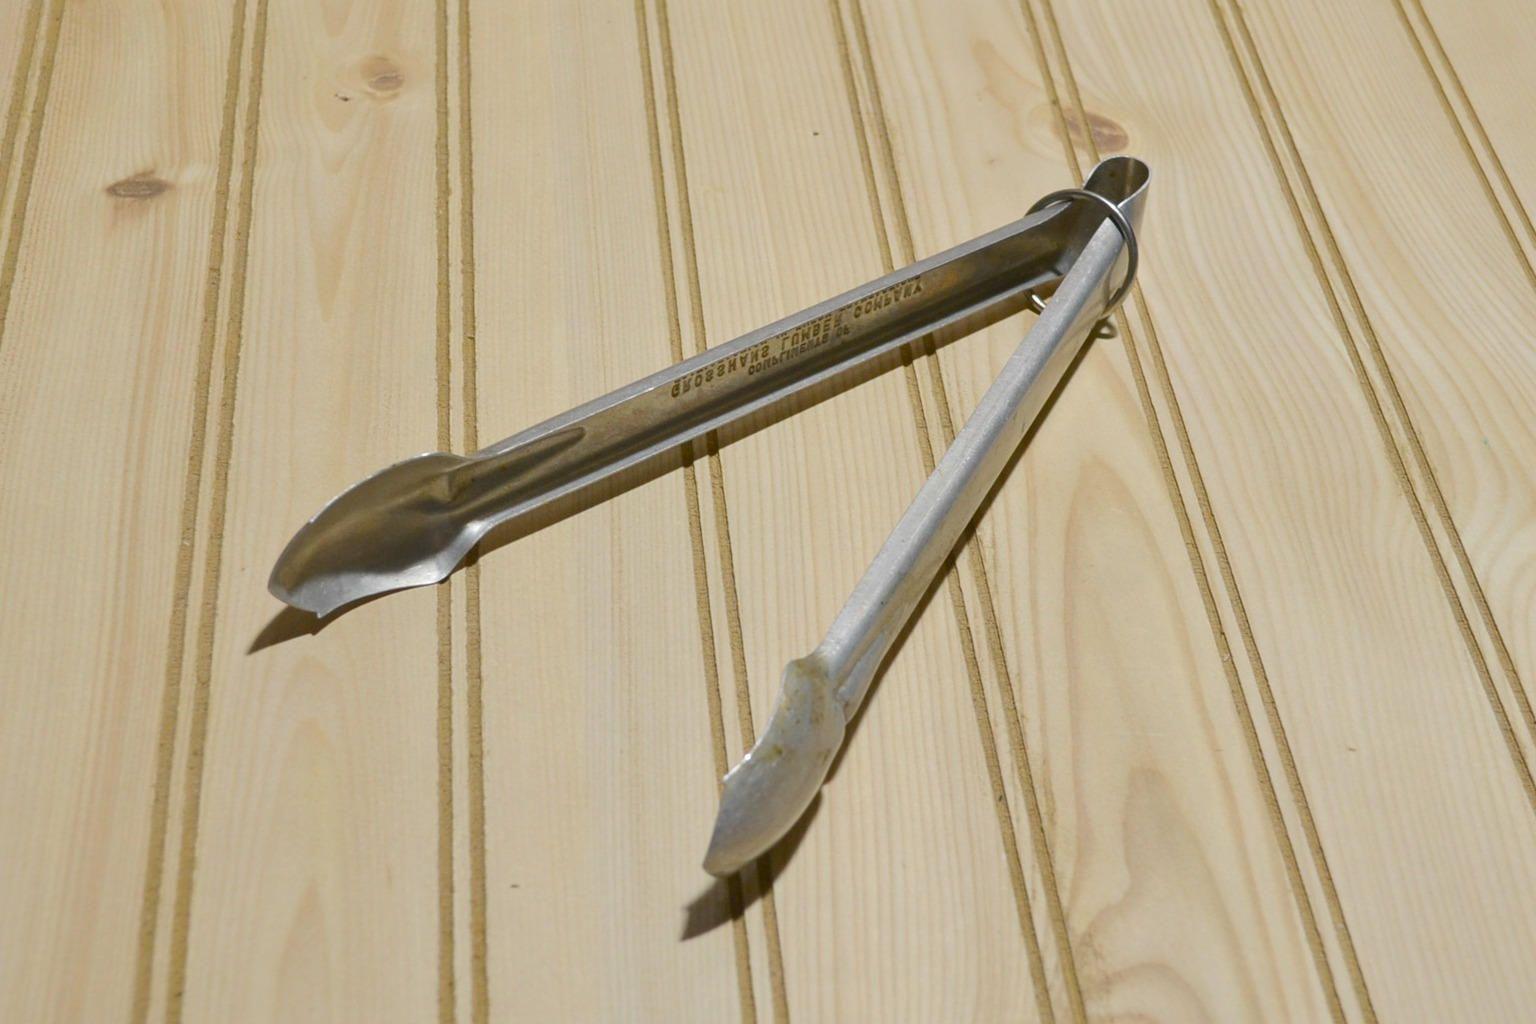 Vintage Anodized Aluminum Tongs